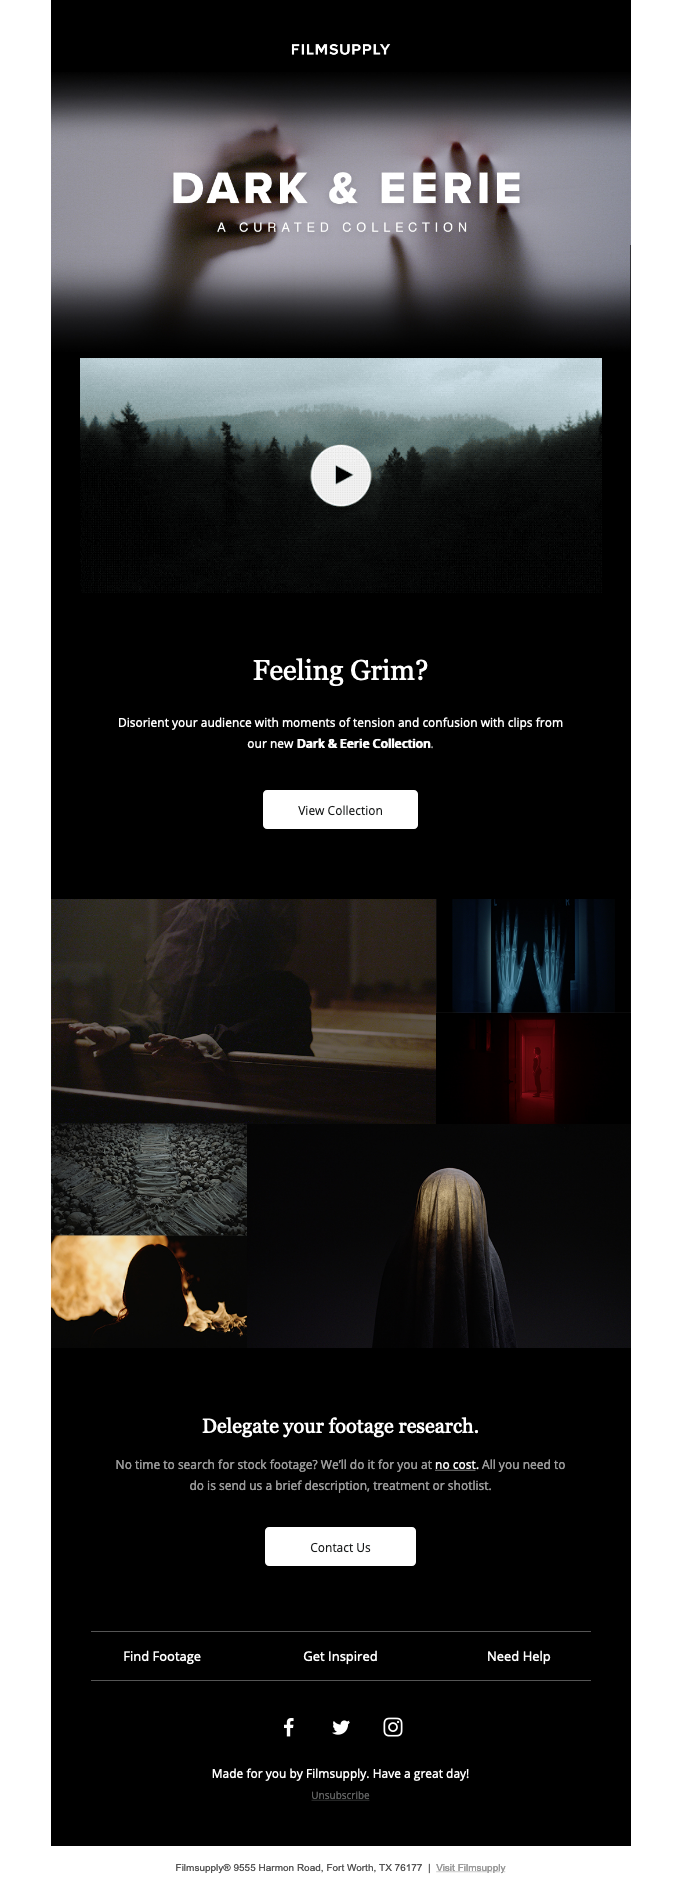 Feeling Grim?